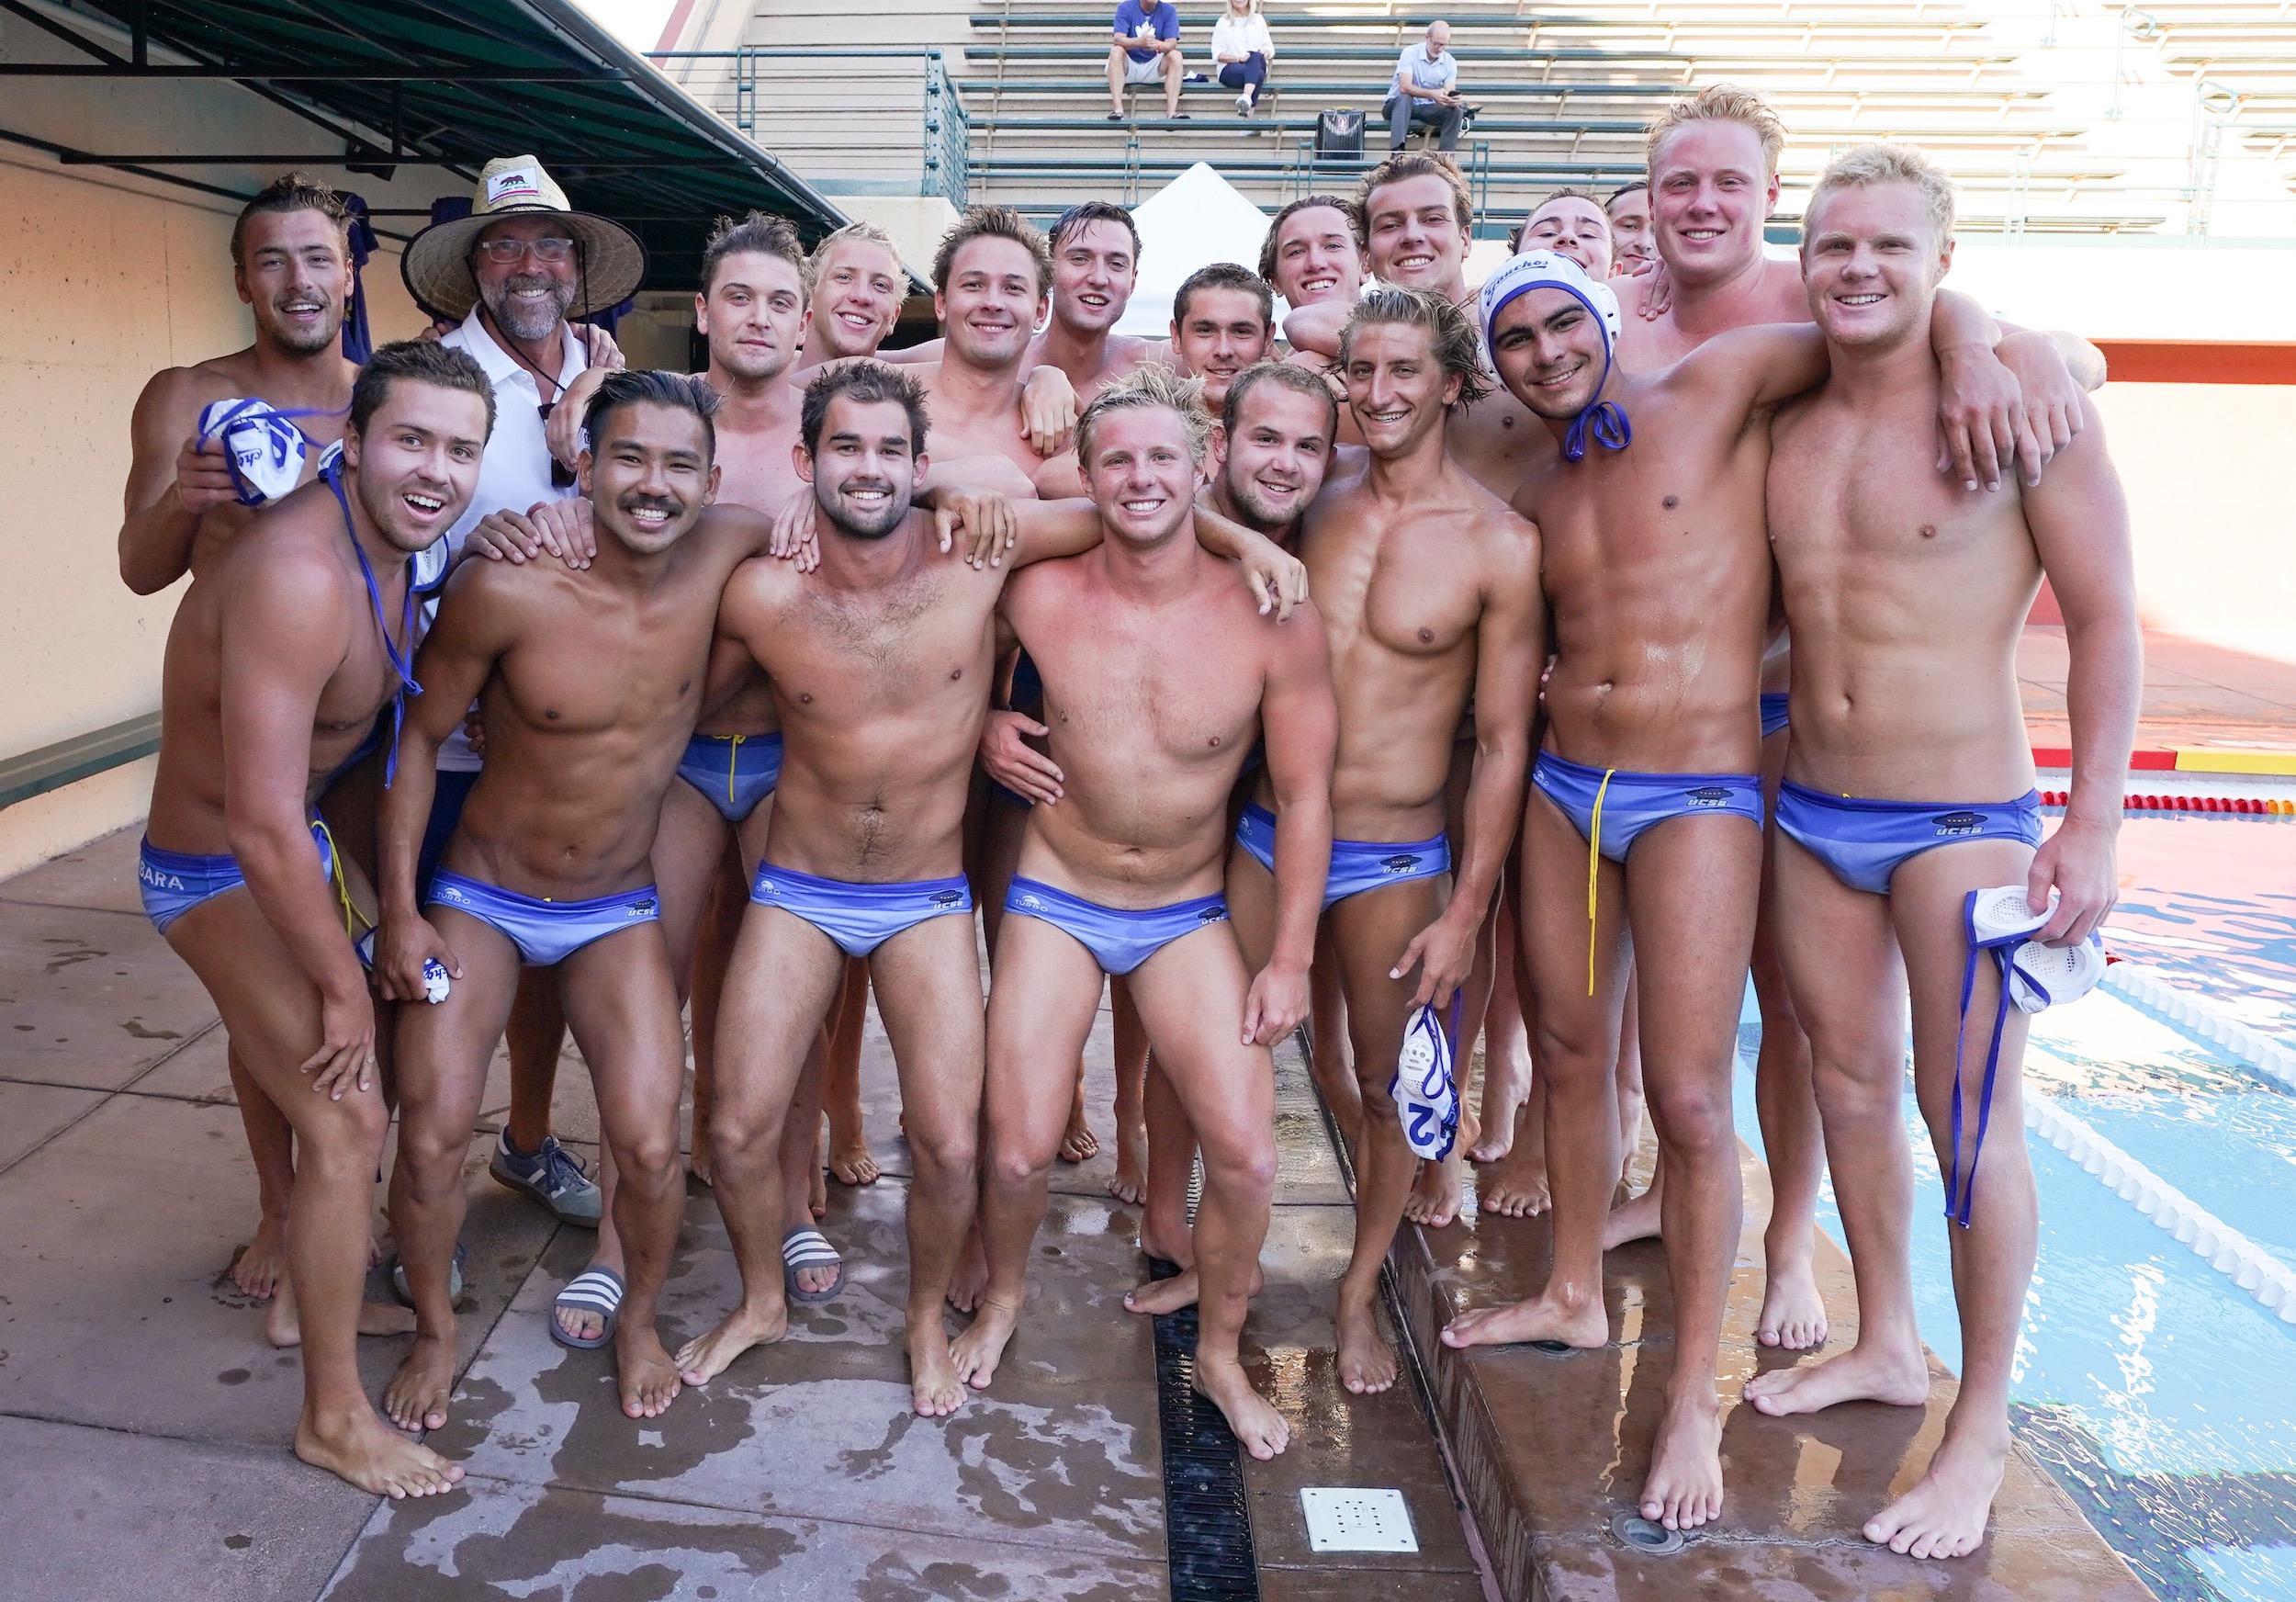 #2 UC Santa Barbara Storms into Avery, Shocks #1 Stanford in Men's Water Polo